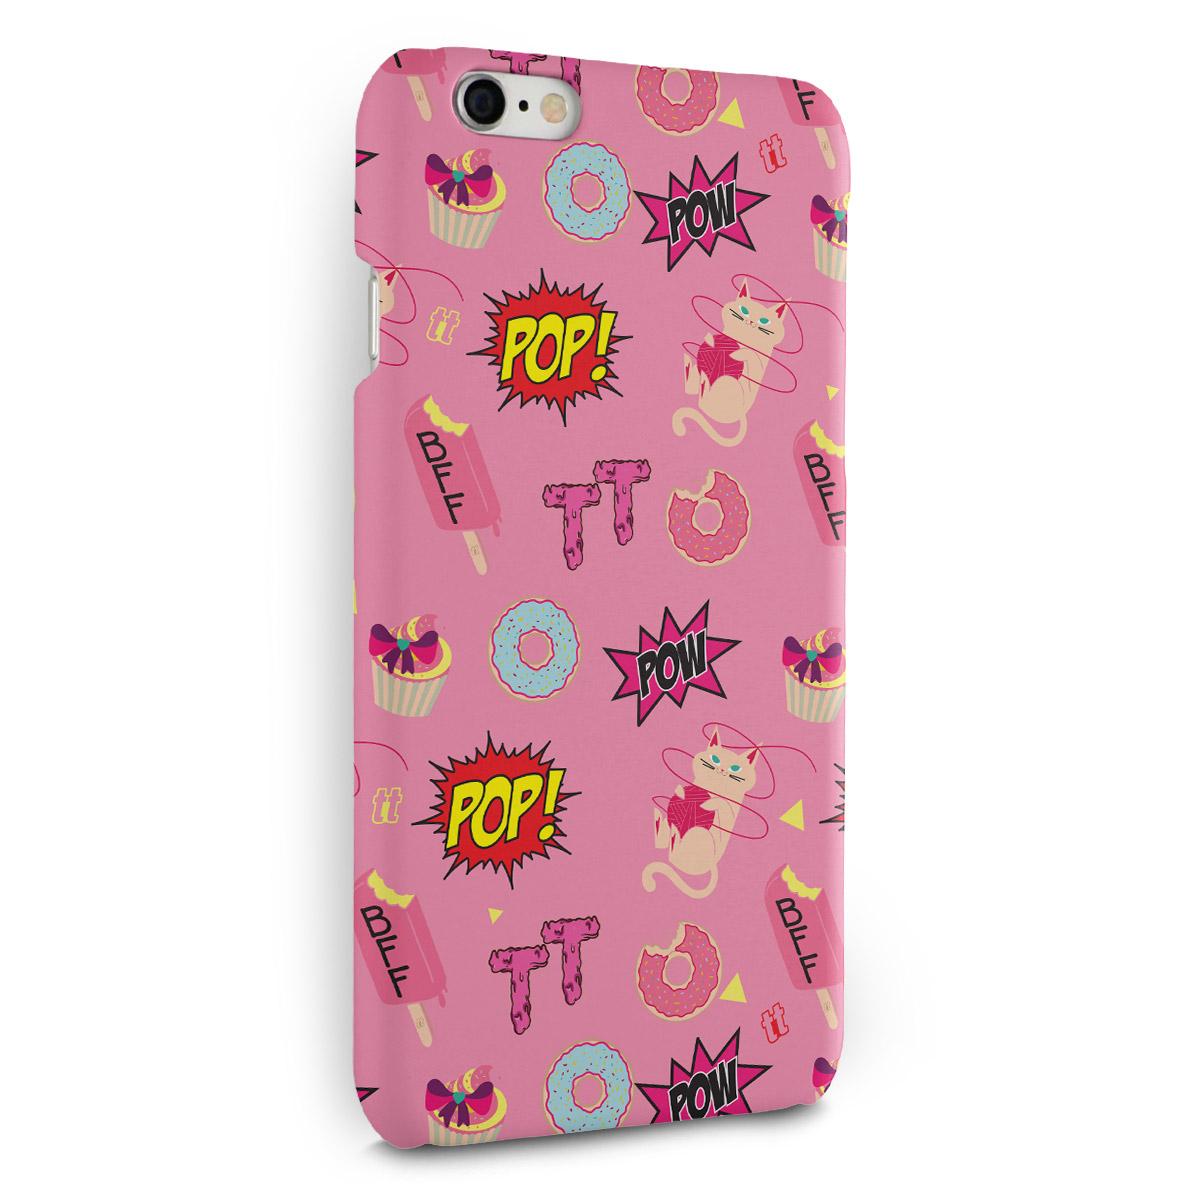 Capa para iPhone 6/6S Plus TodaTeen POP!